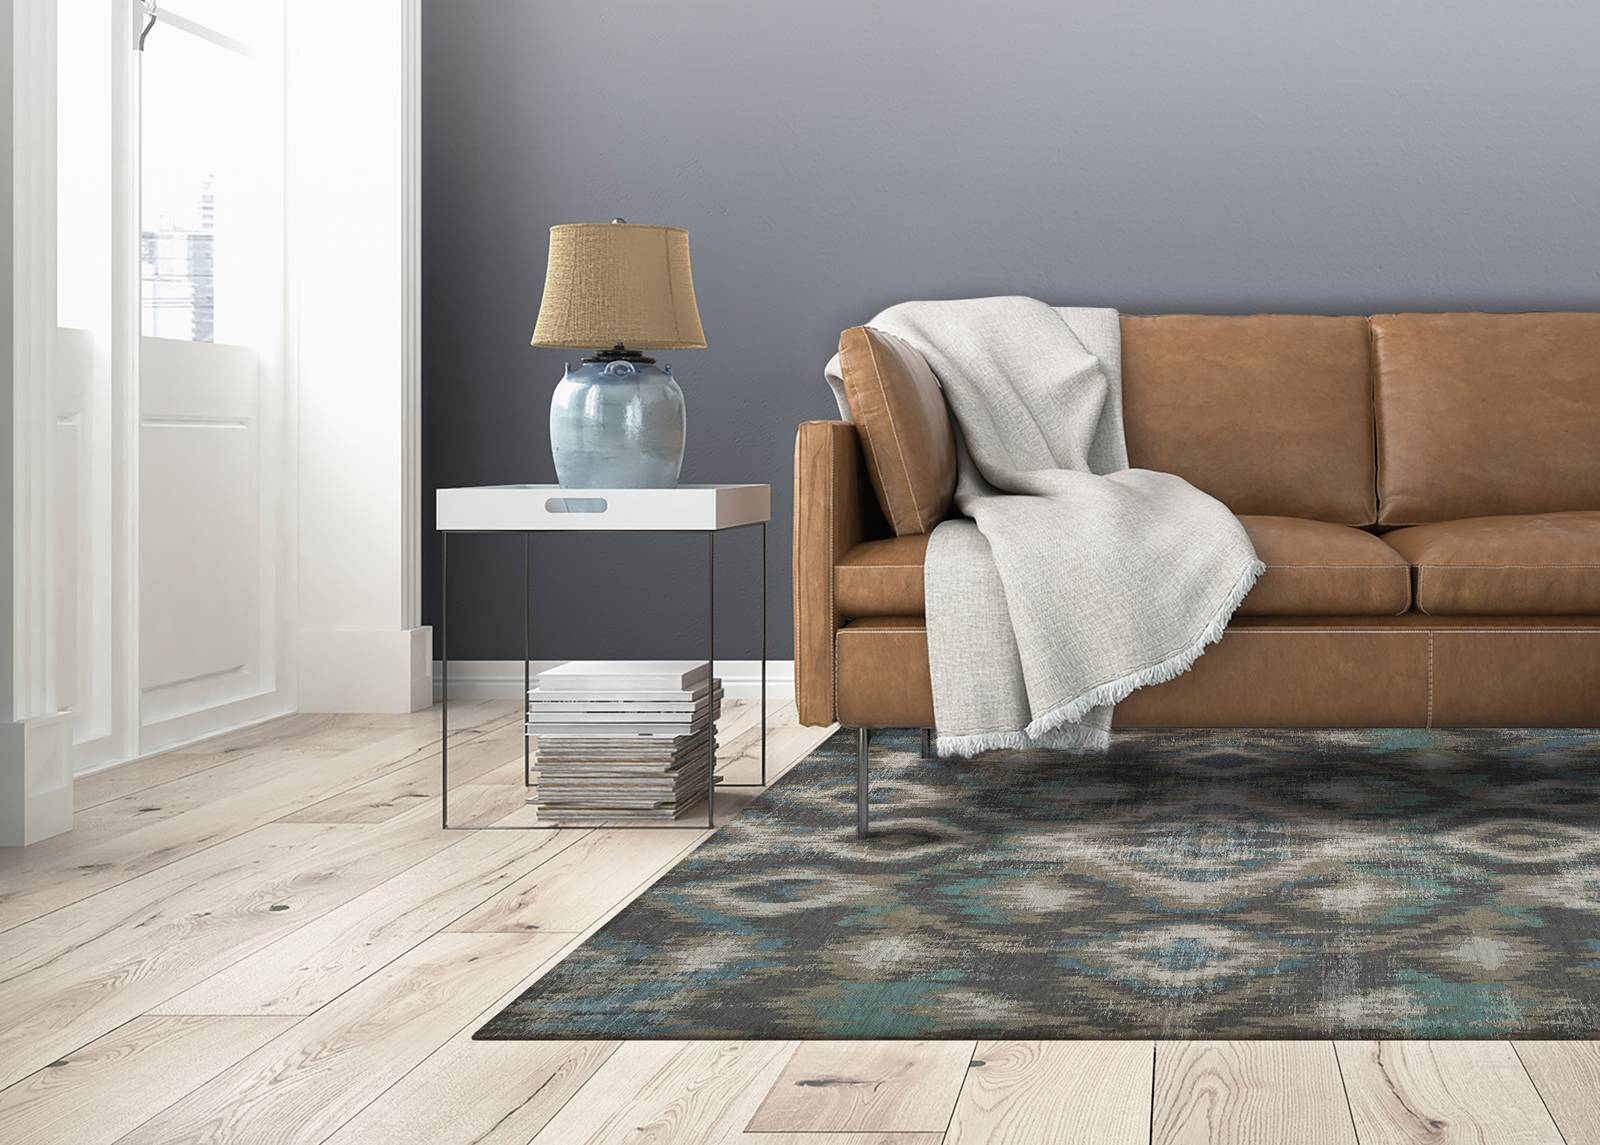 Magic home matto HARPUT 160x230 cm